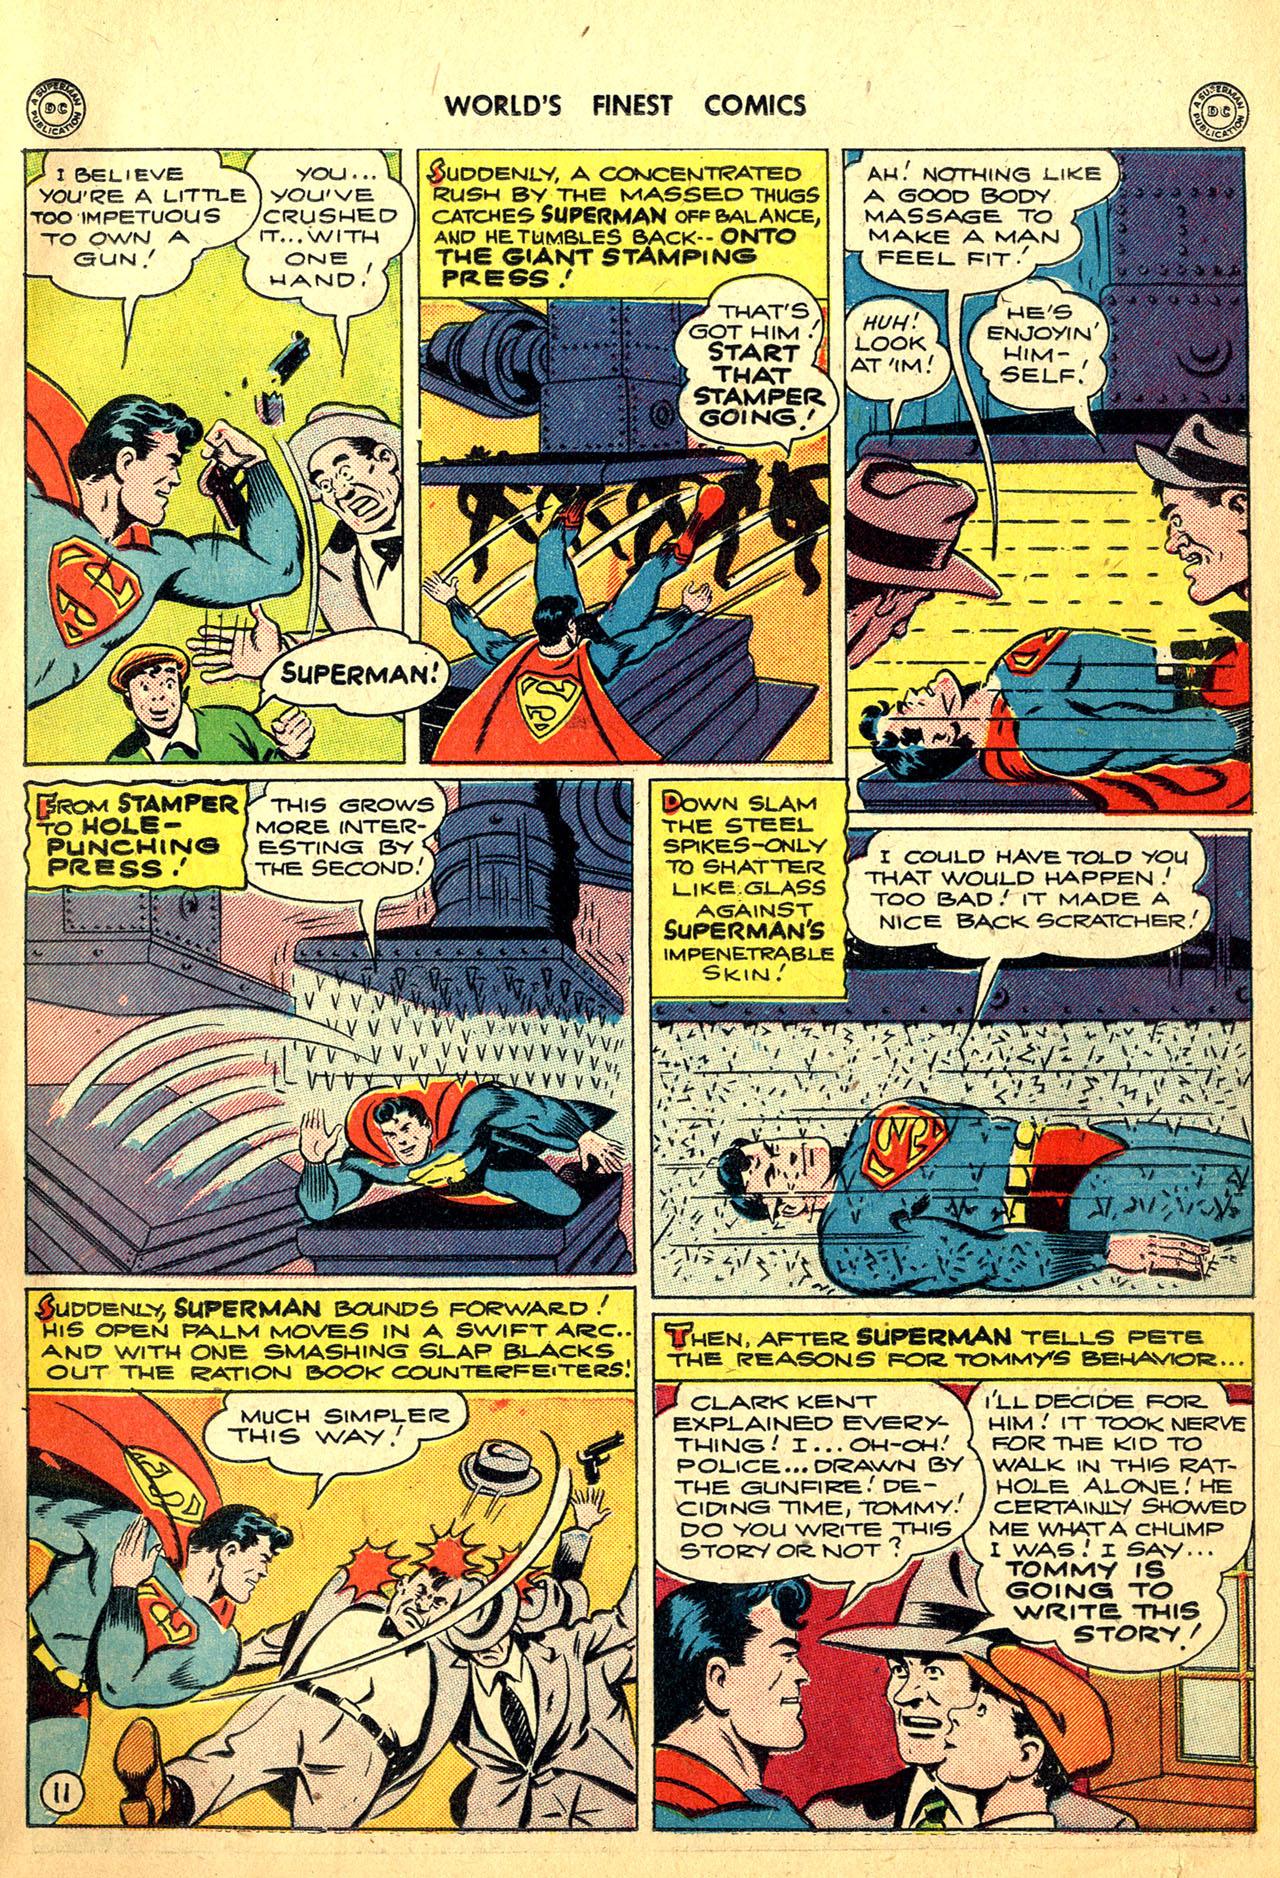 Read online World's Finest Comics comic -  Issue #18 - 13